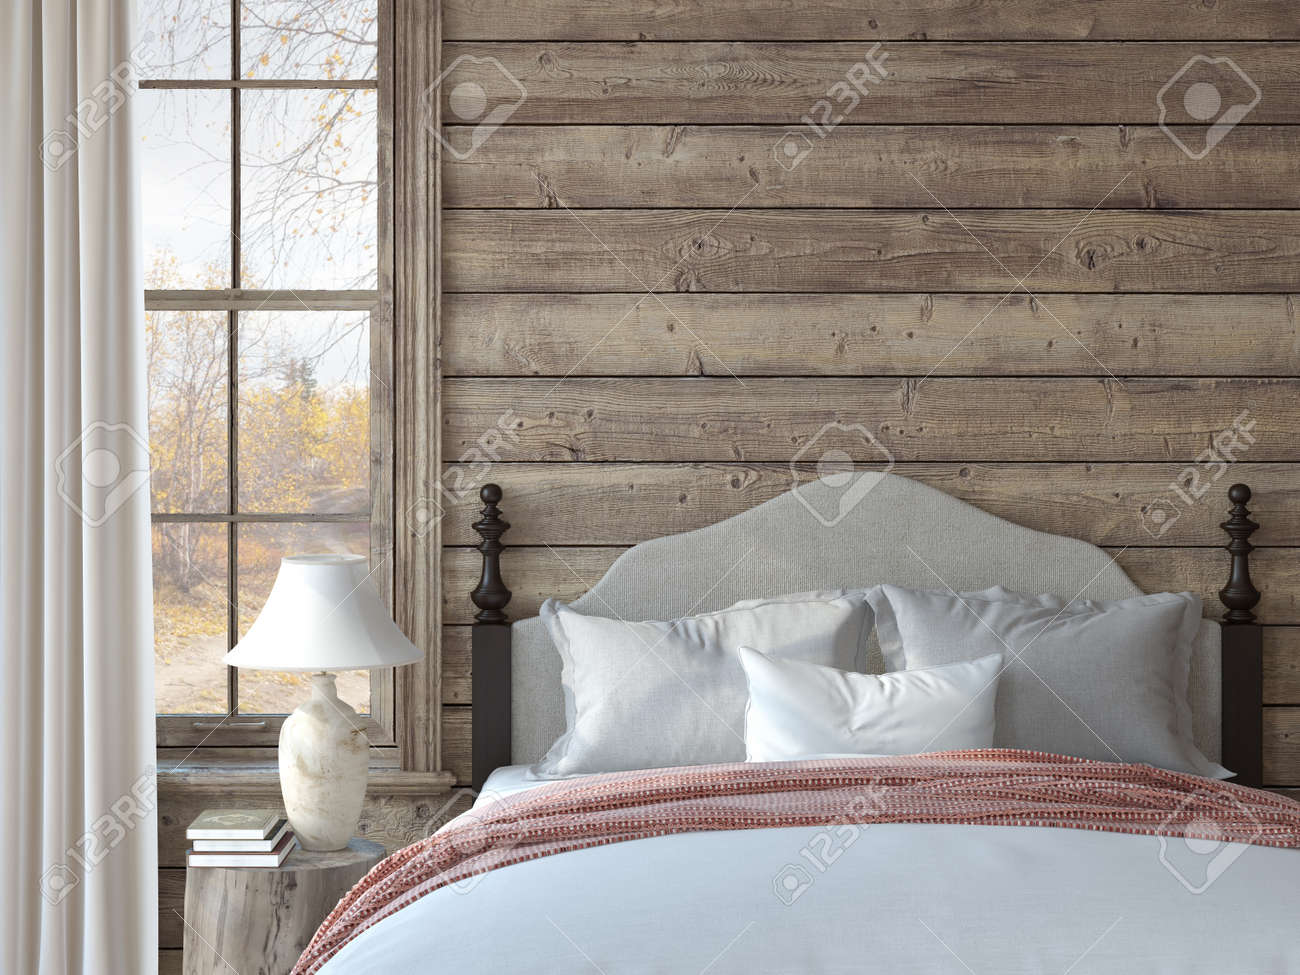 Bedroom in ranch house. Interior mockup. 3d render. - 163279004